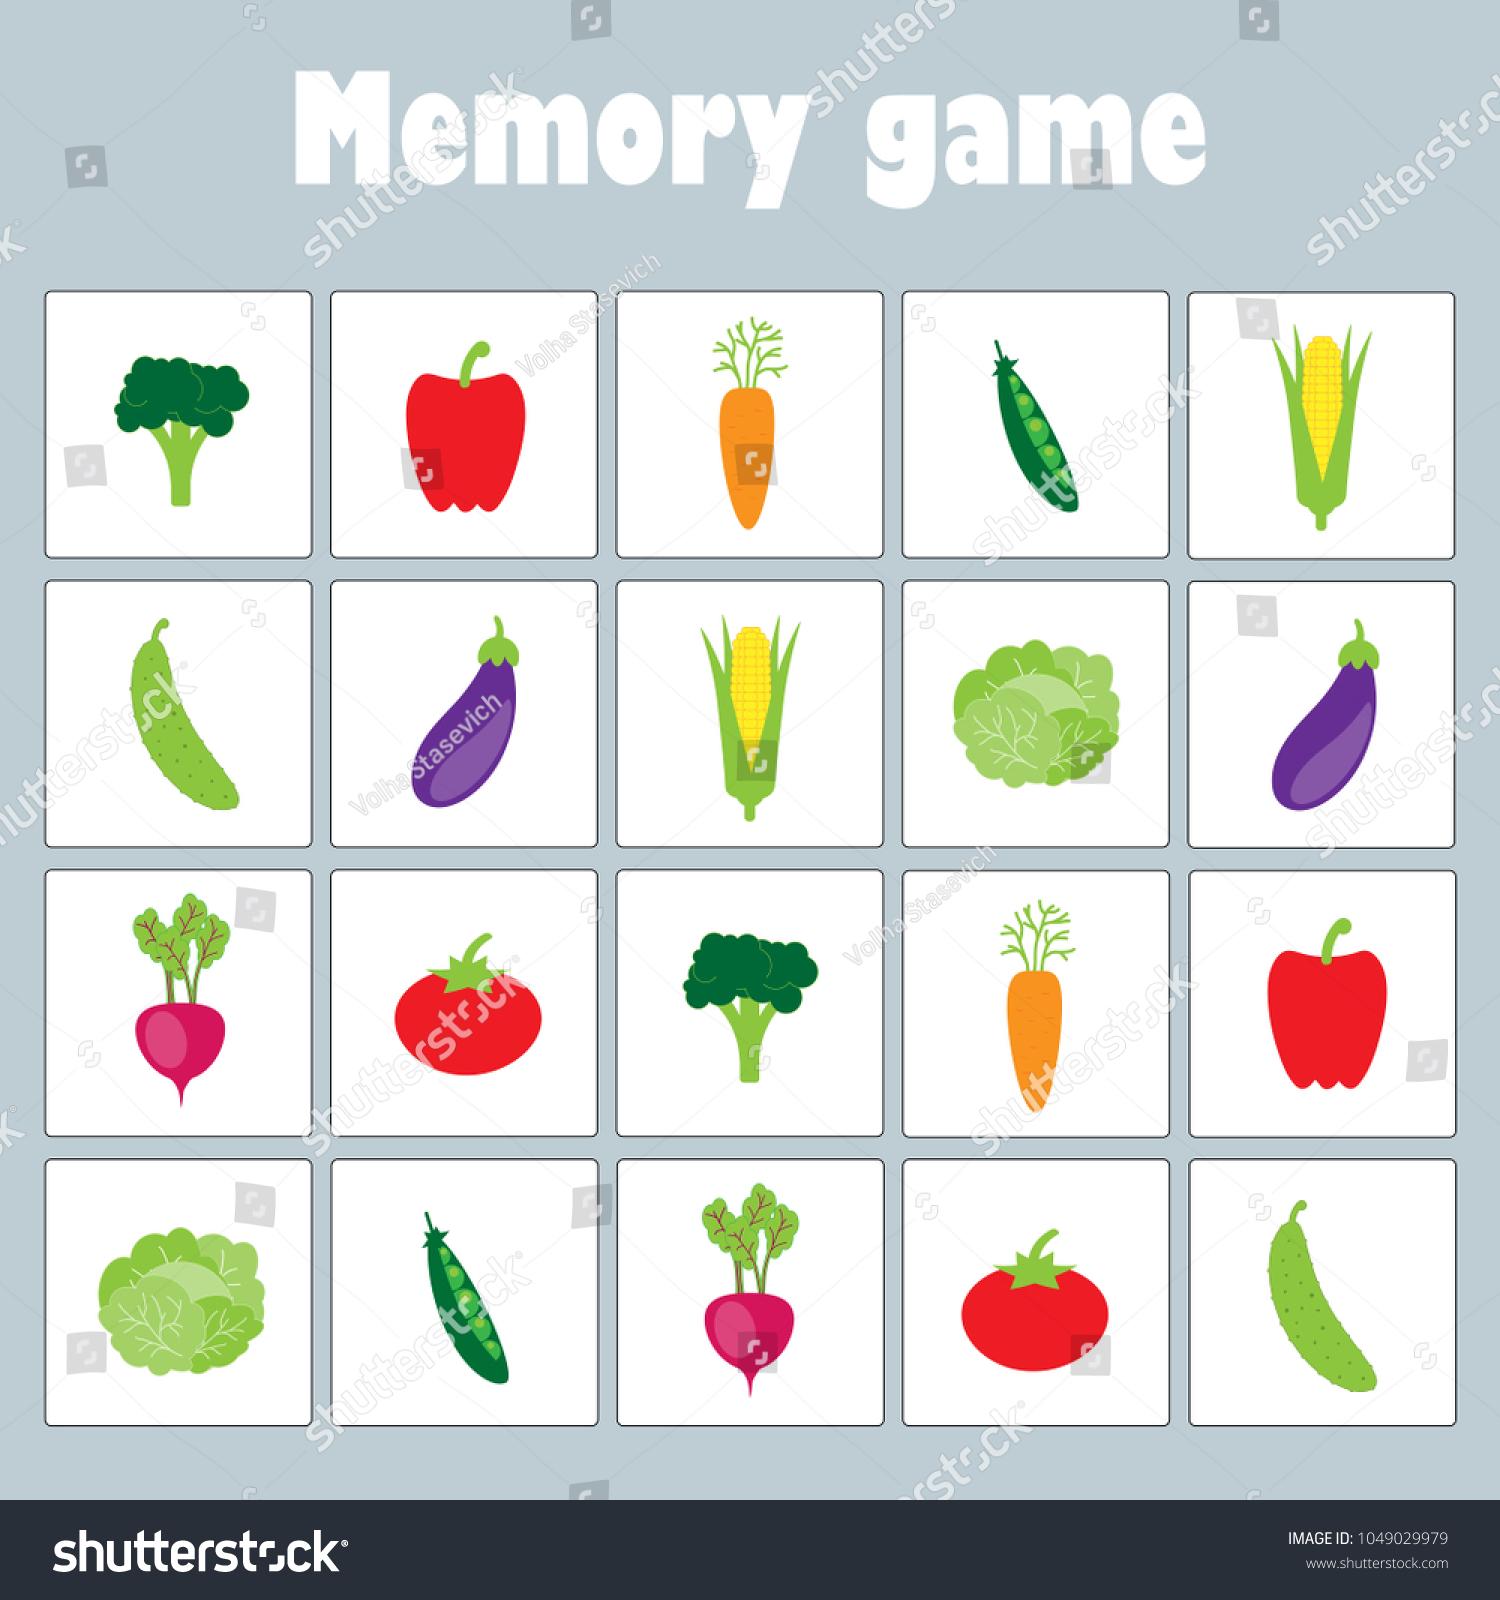 memory game pictures different vegetables children のベクター画像